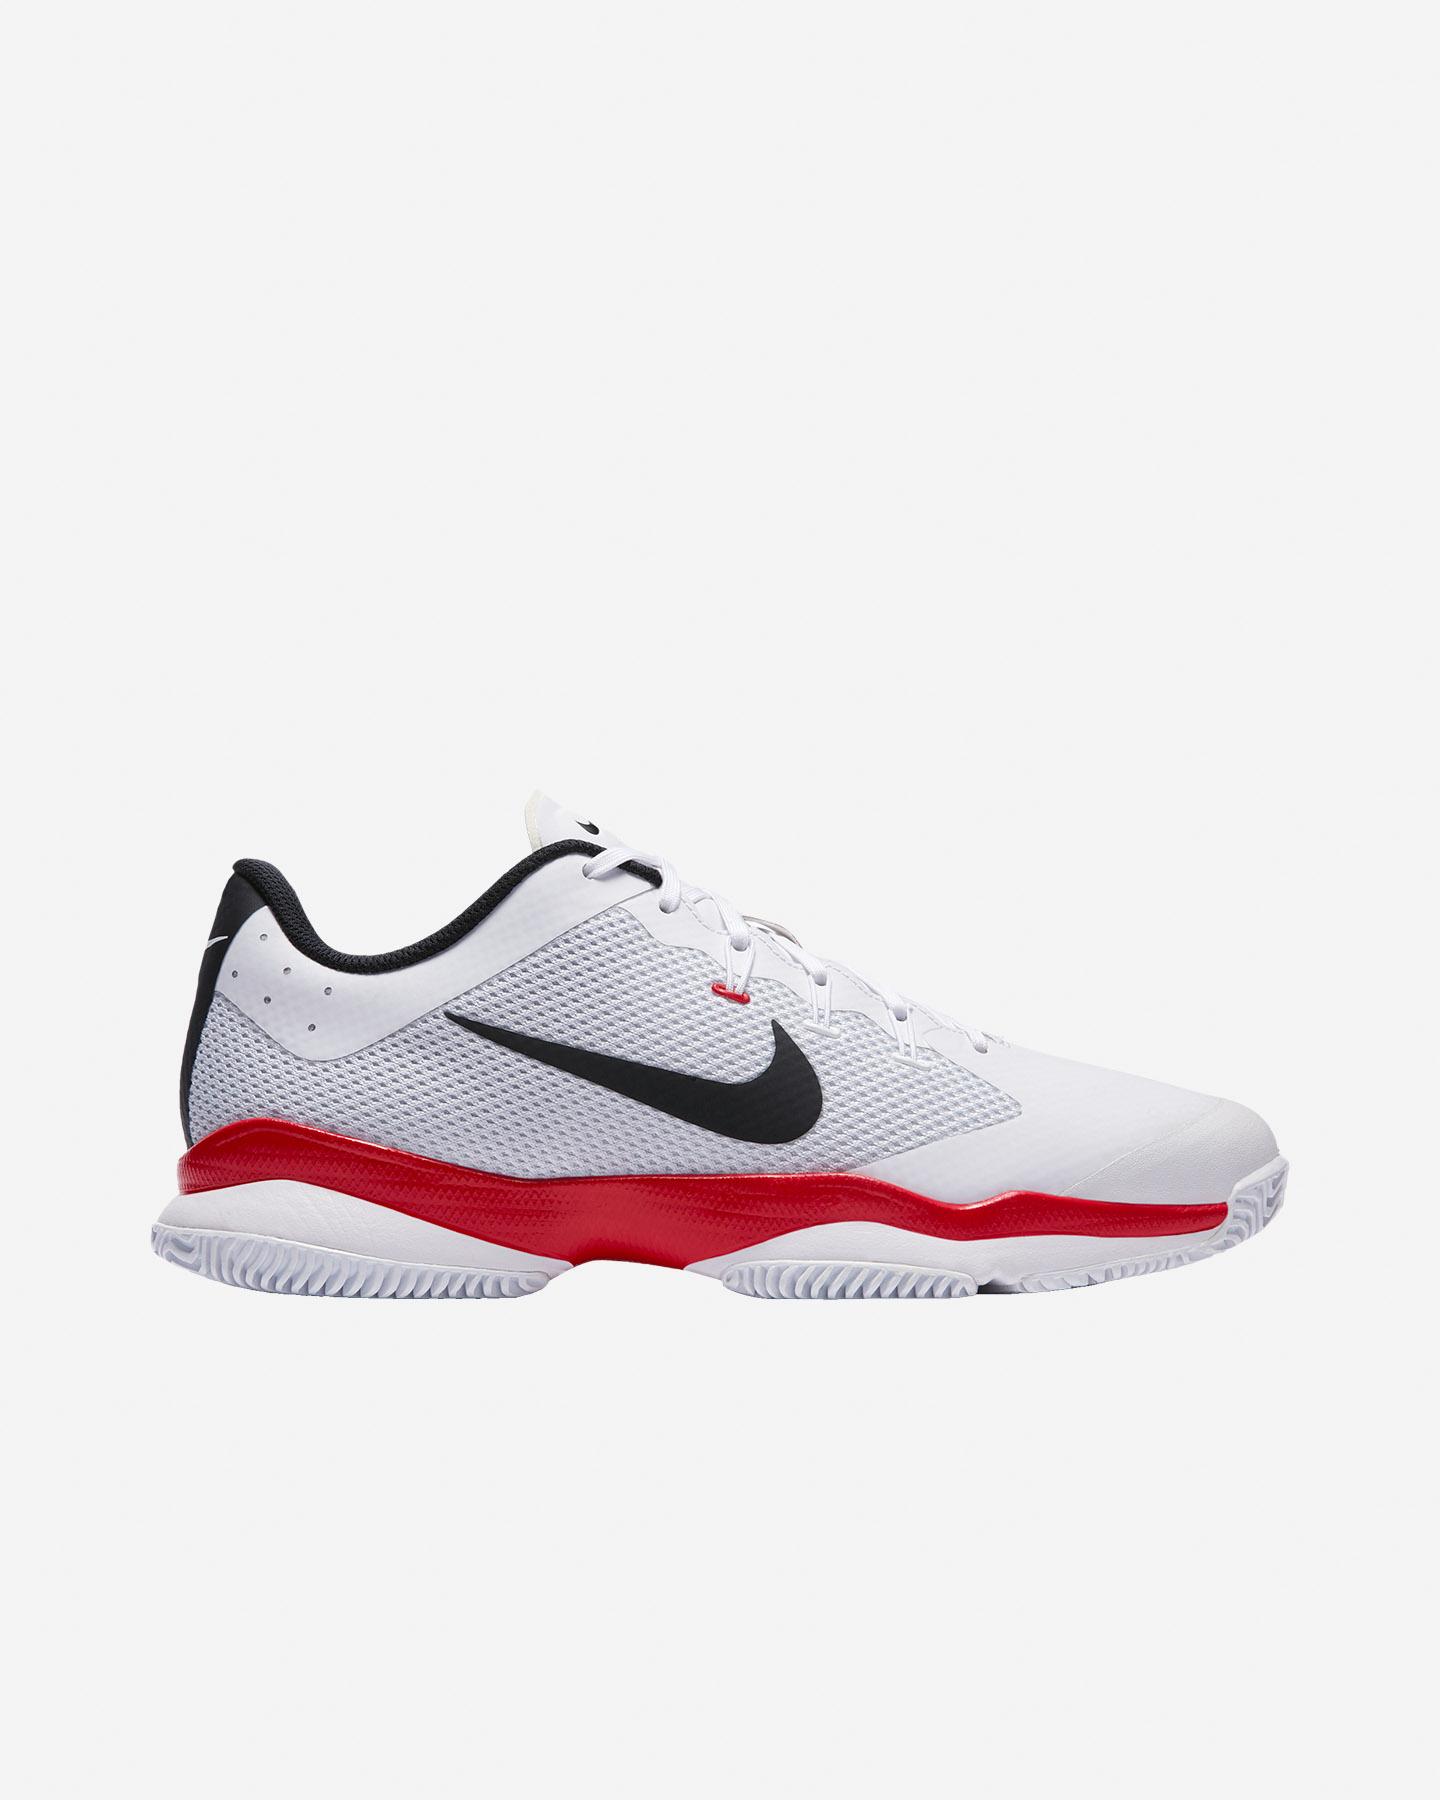 promo code 138b2 93917 M Sport Scarpe Su Nike Zoom Cisalfa Air 845007 Tennis Ultra zxqxTFwtA